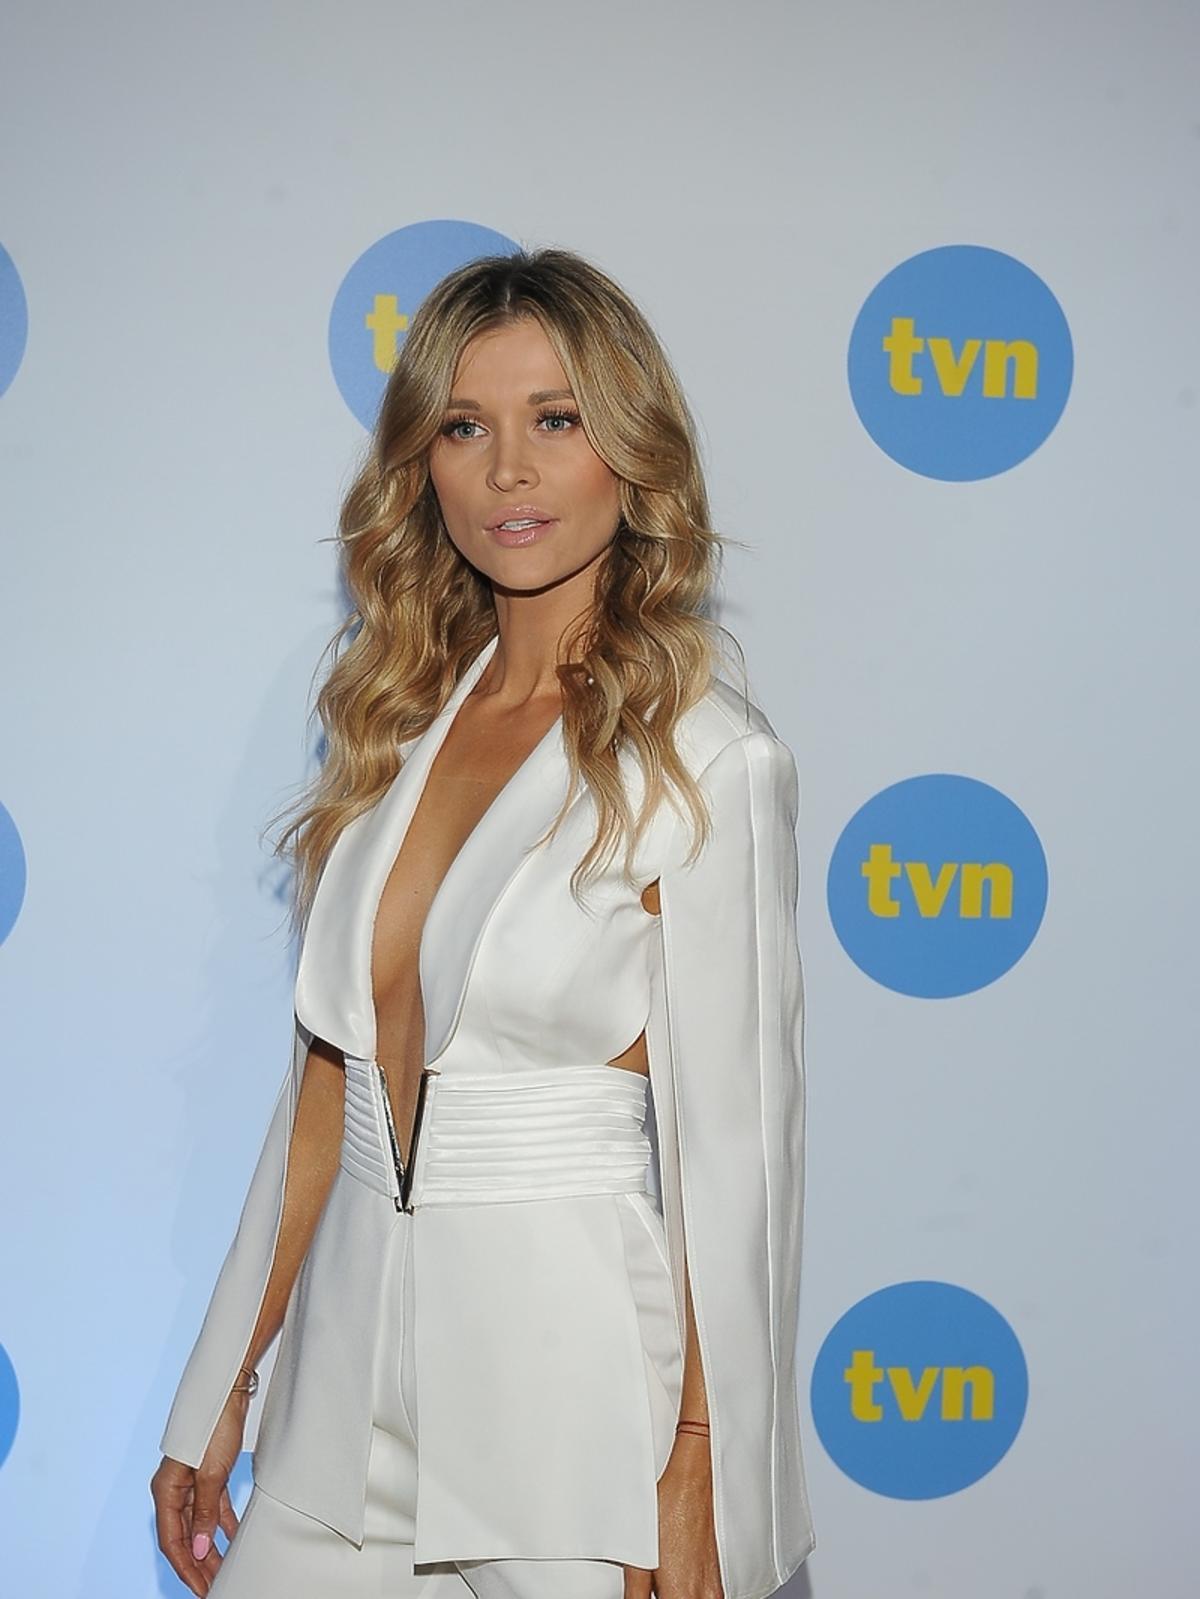 Joanna Krupa na ramówce TVN 2017 - Top Model